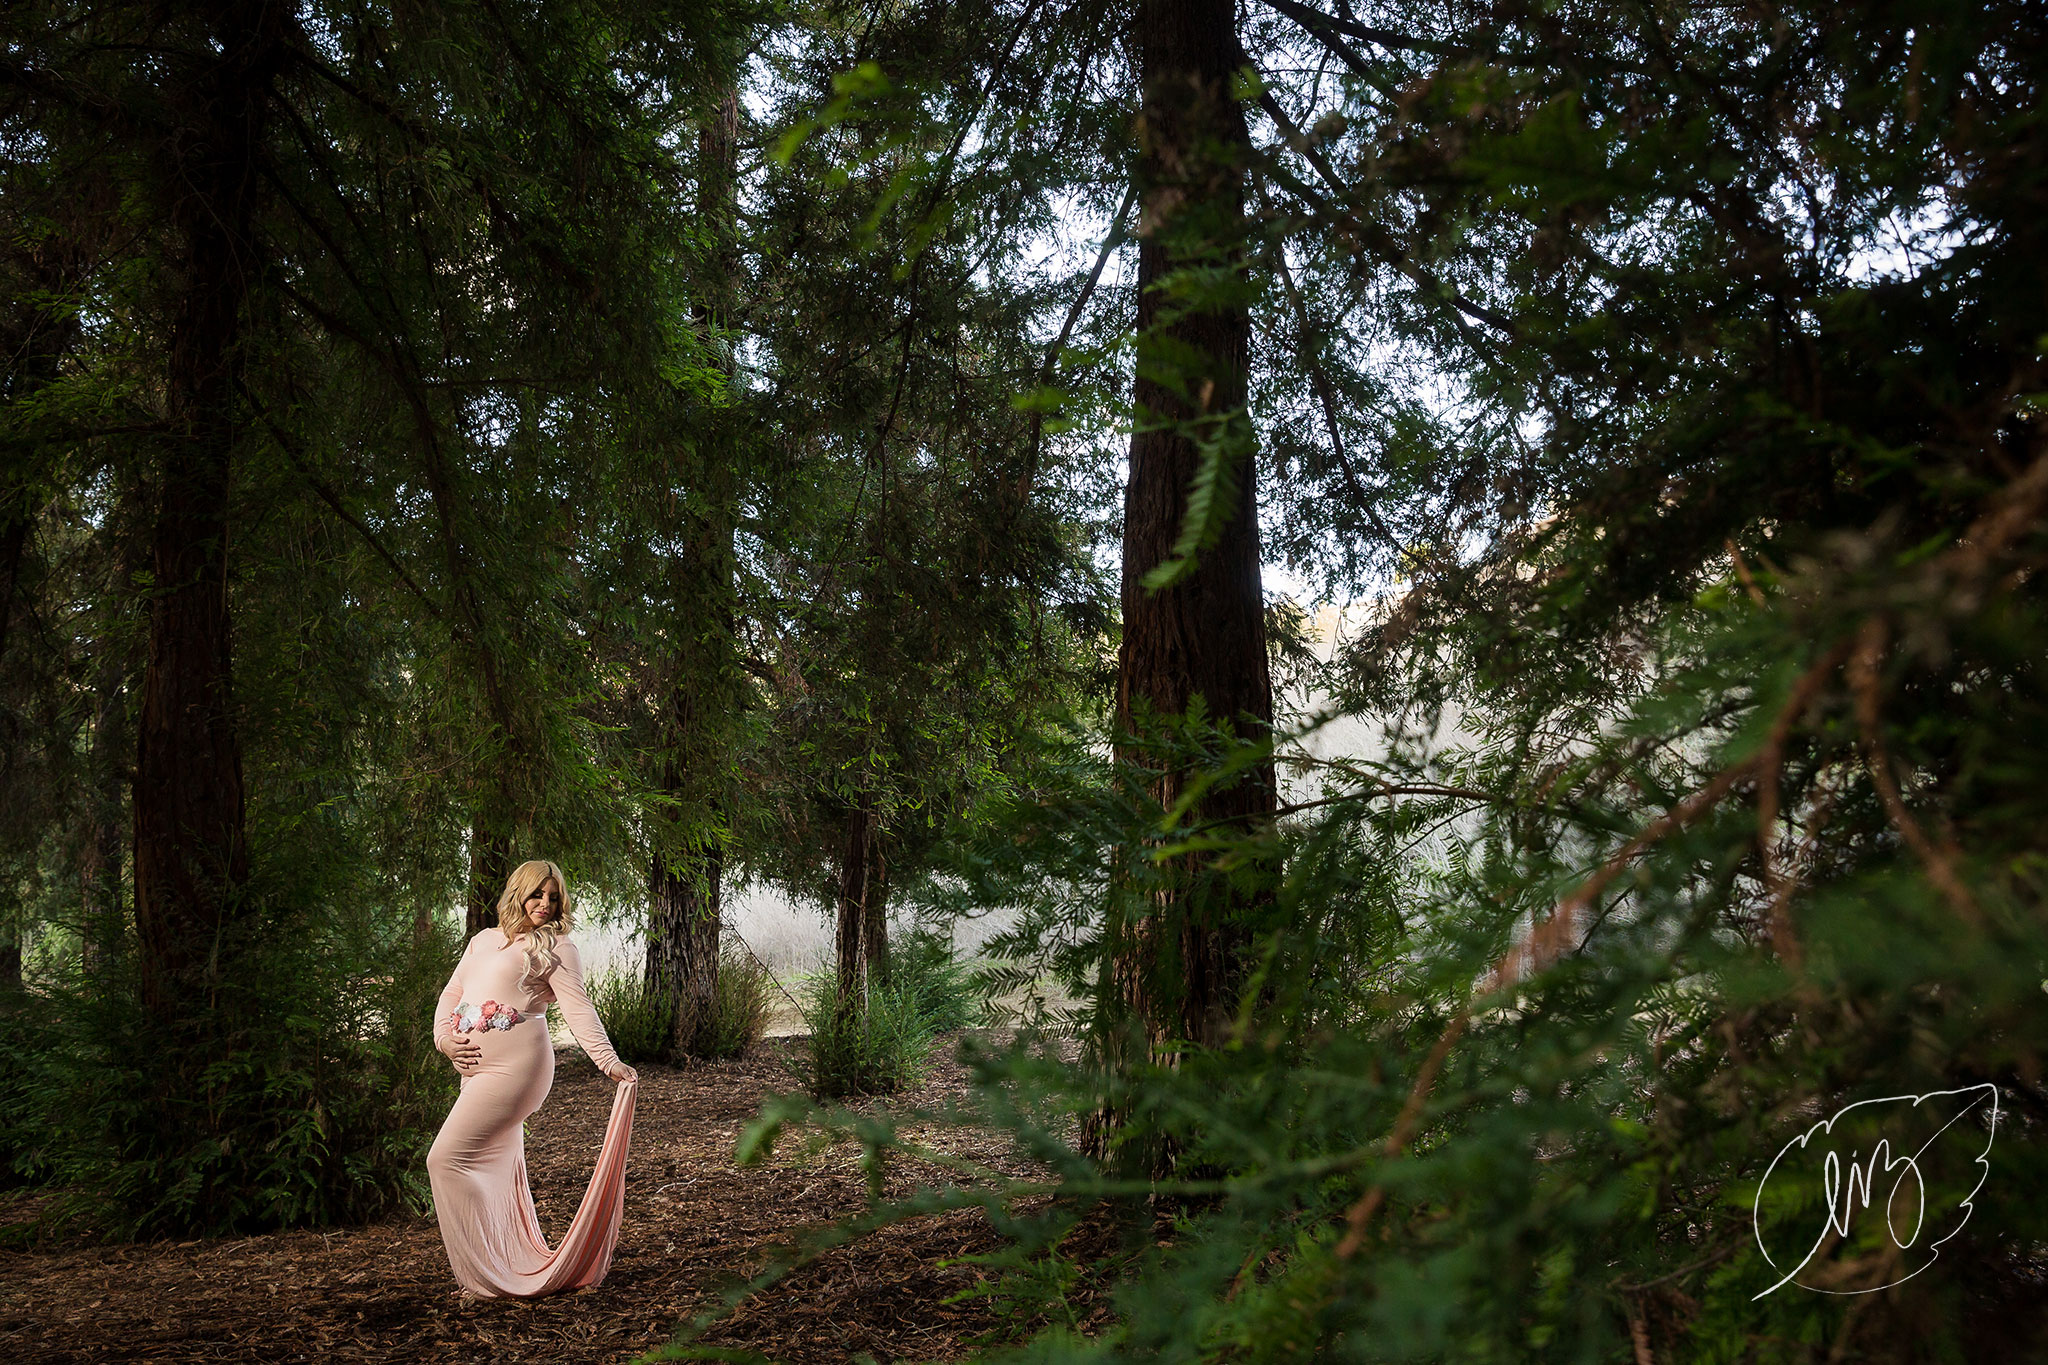 California_Inland_Empire_Maternity_Photographer_03.jpg